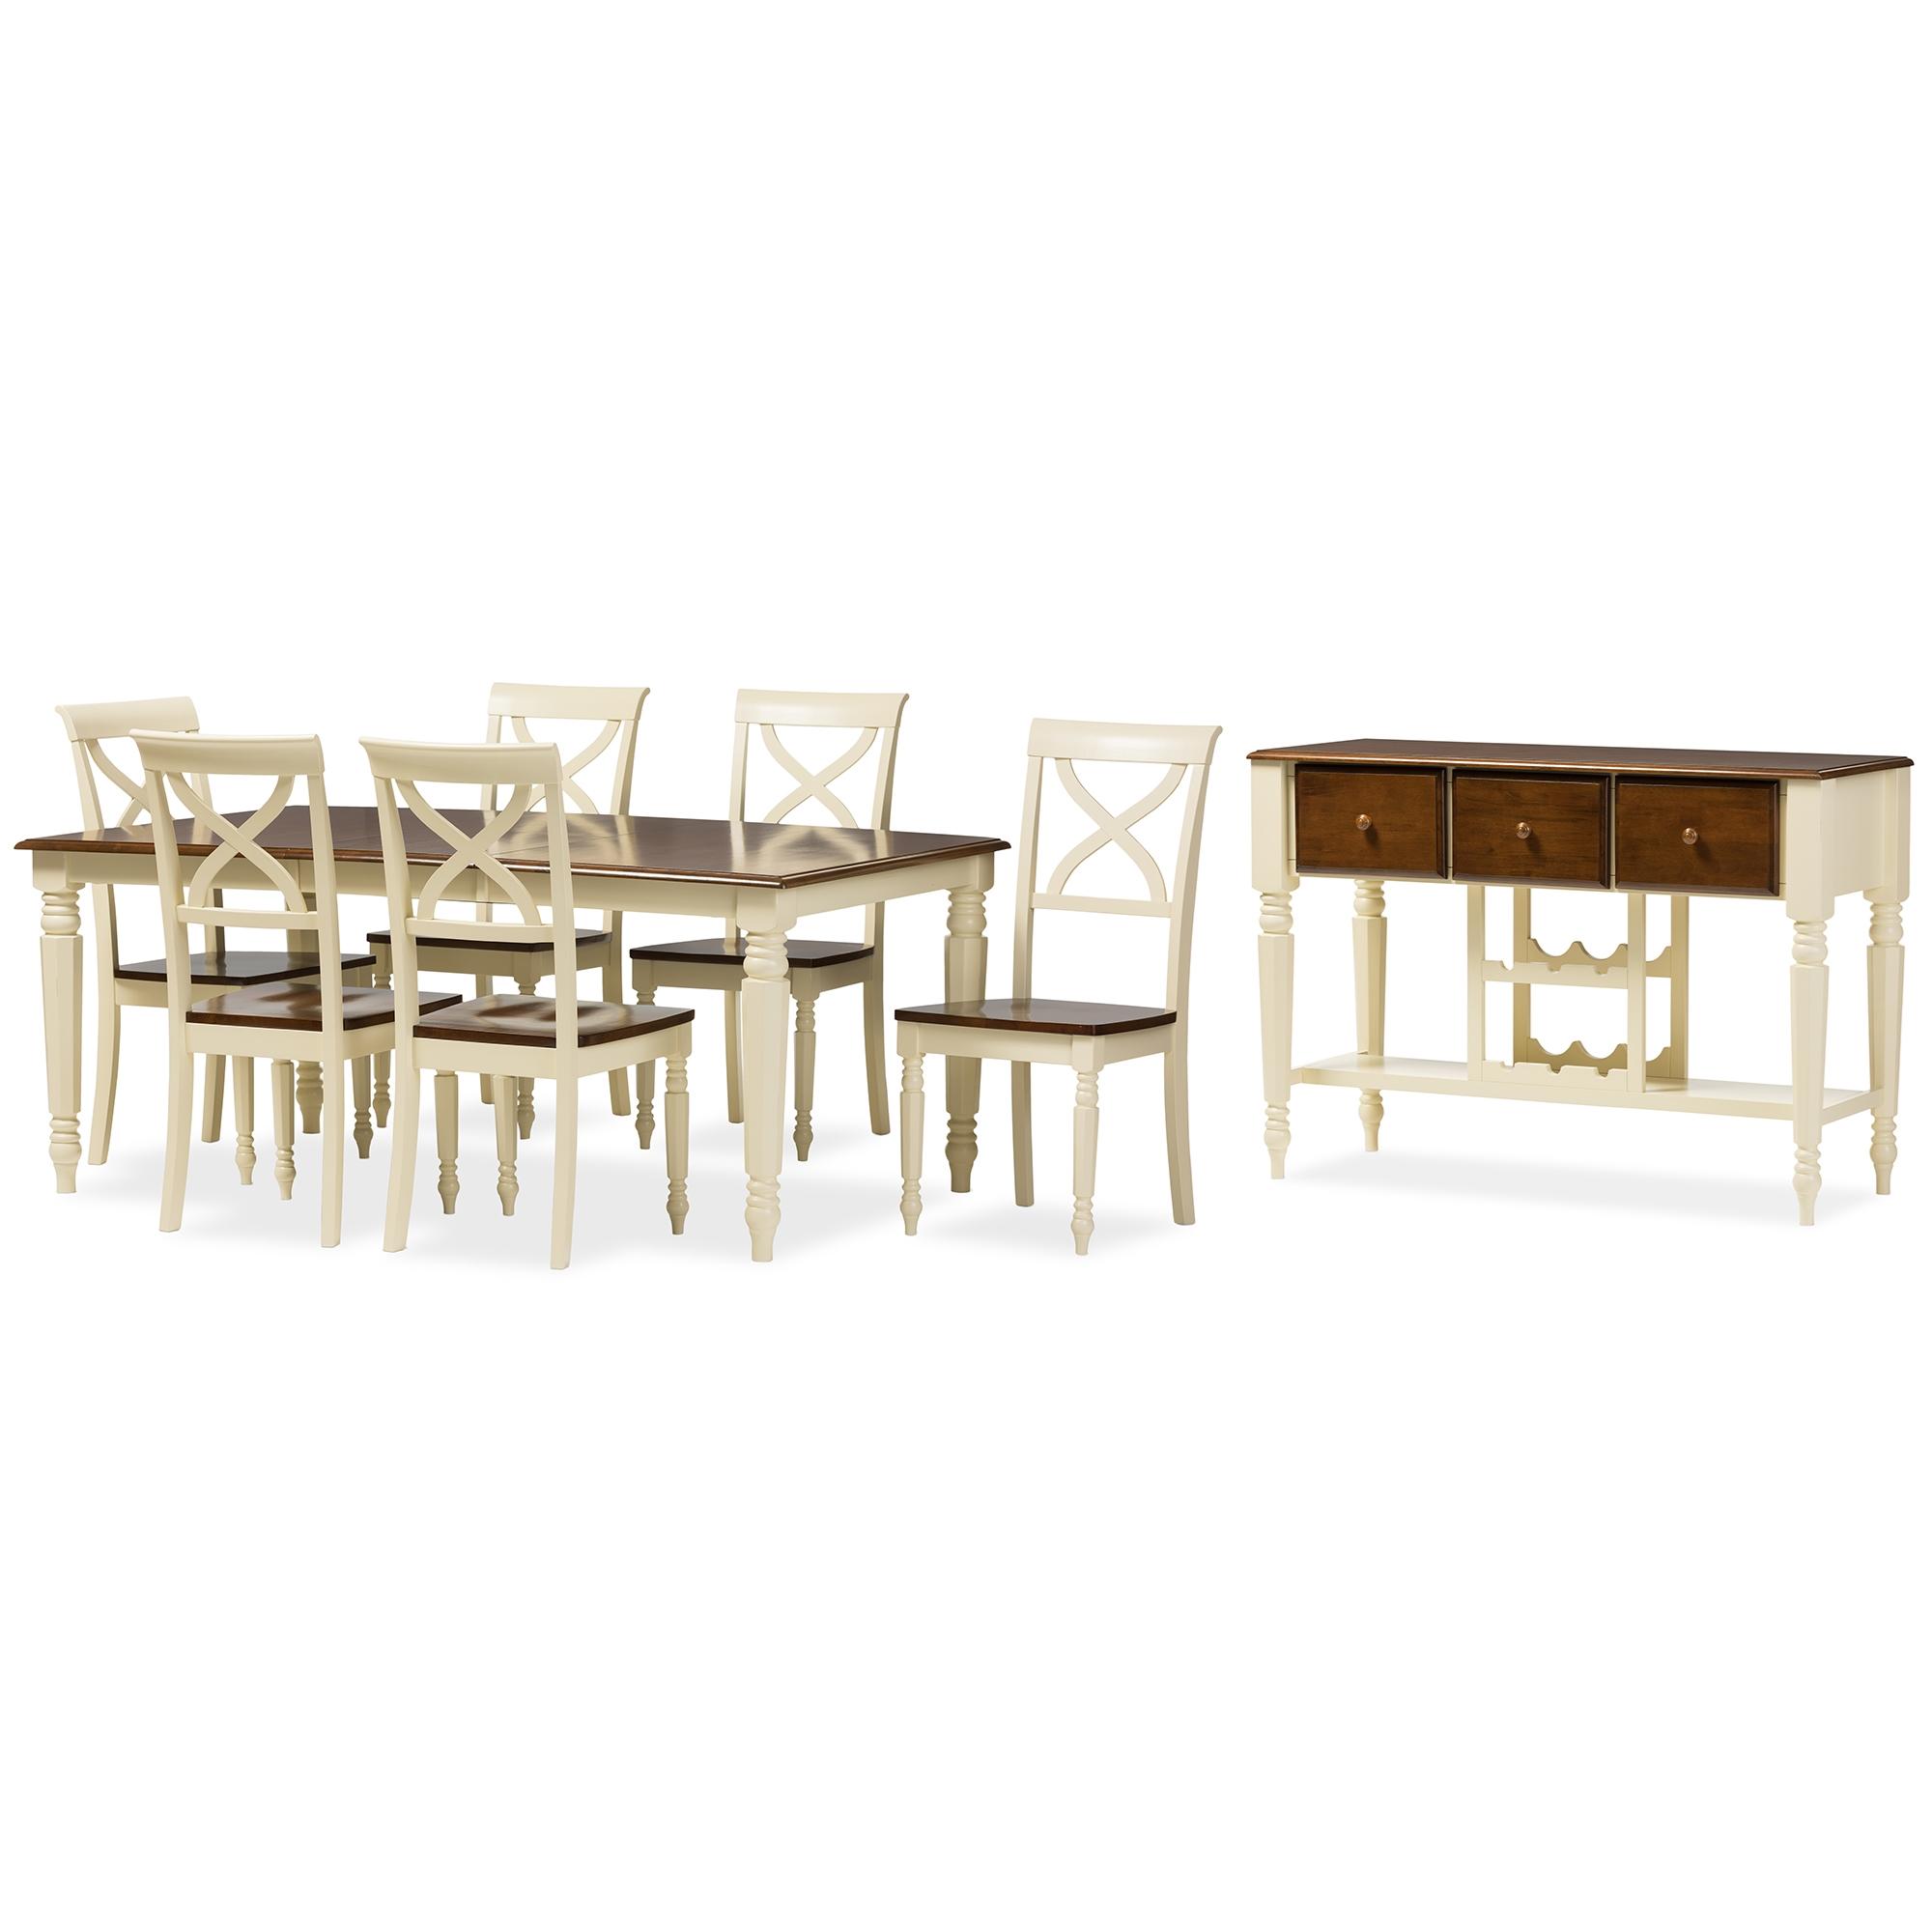 Wholesale 8 Piece Sets   Wholesale Dining Room Furniture   Wholesale  Furniture